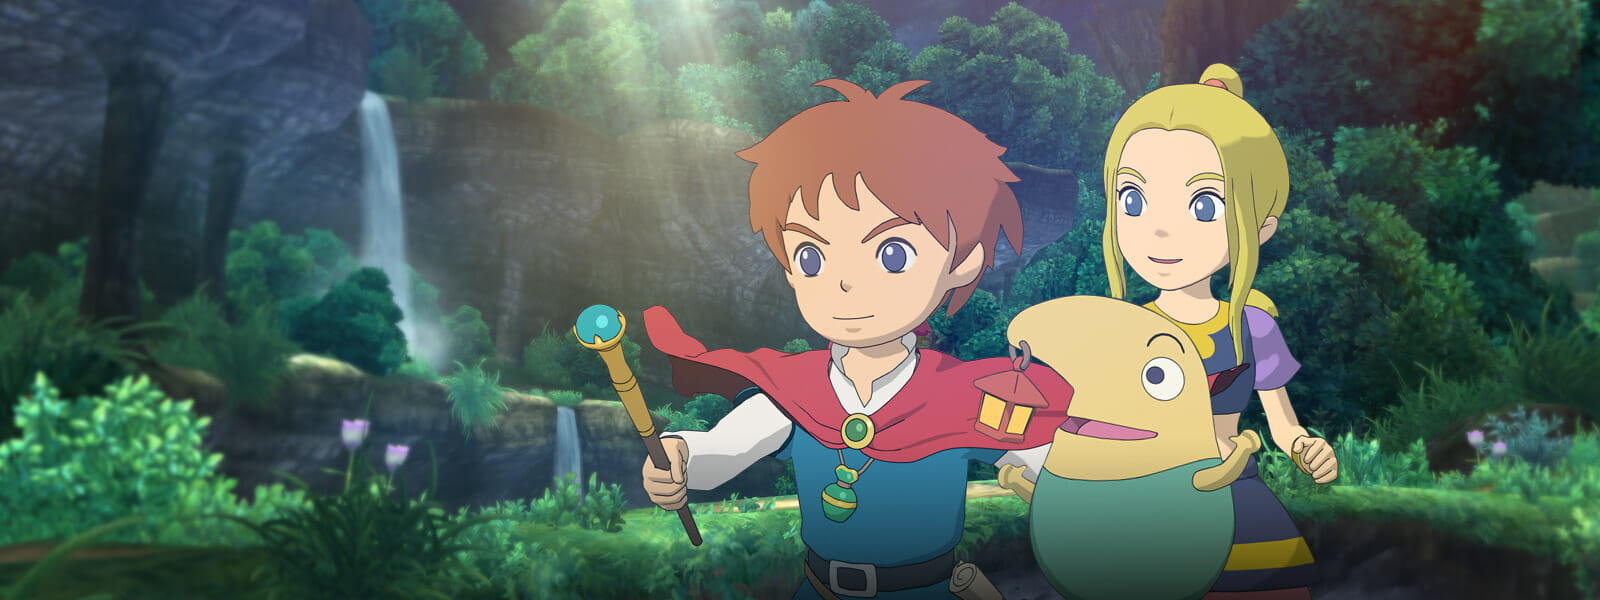 Ni no Kuni and Kids' Games: Simplicity without Patronizing 2